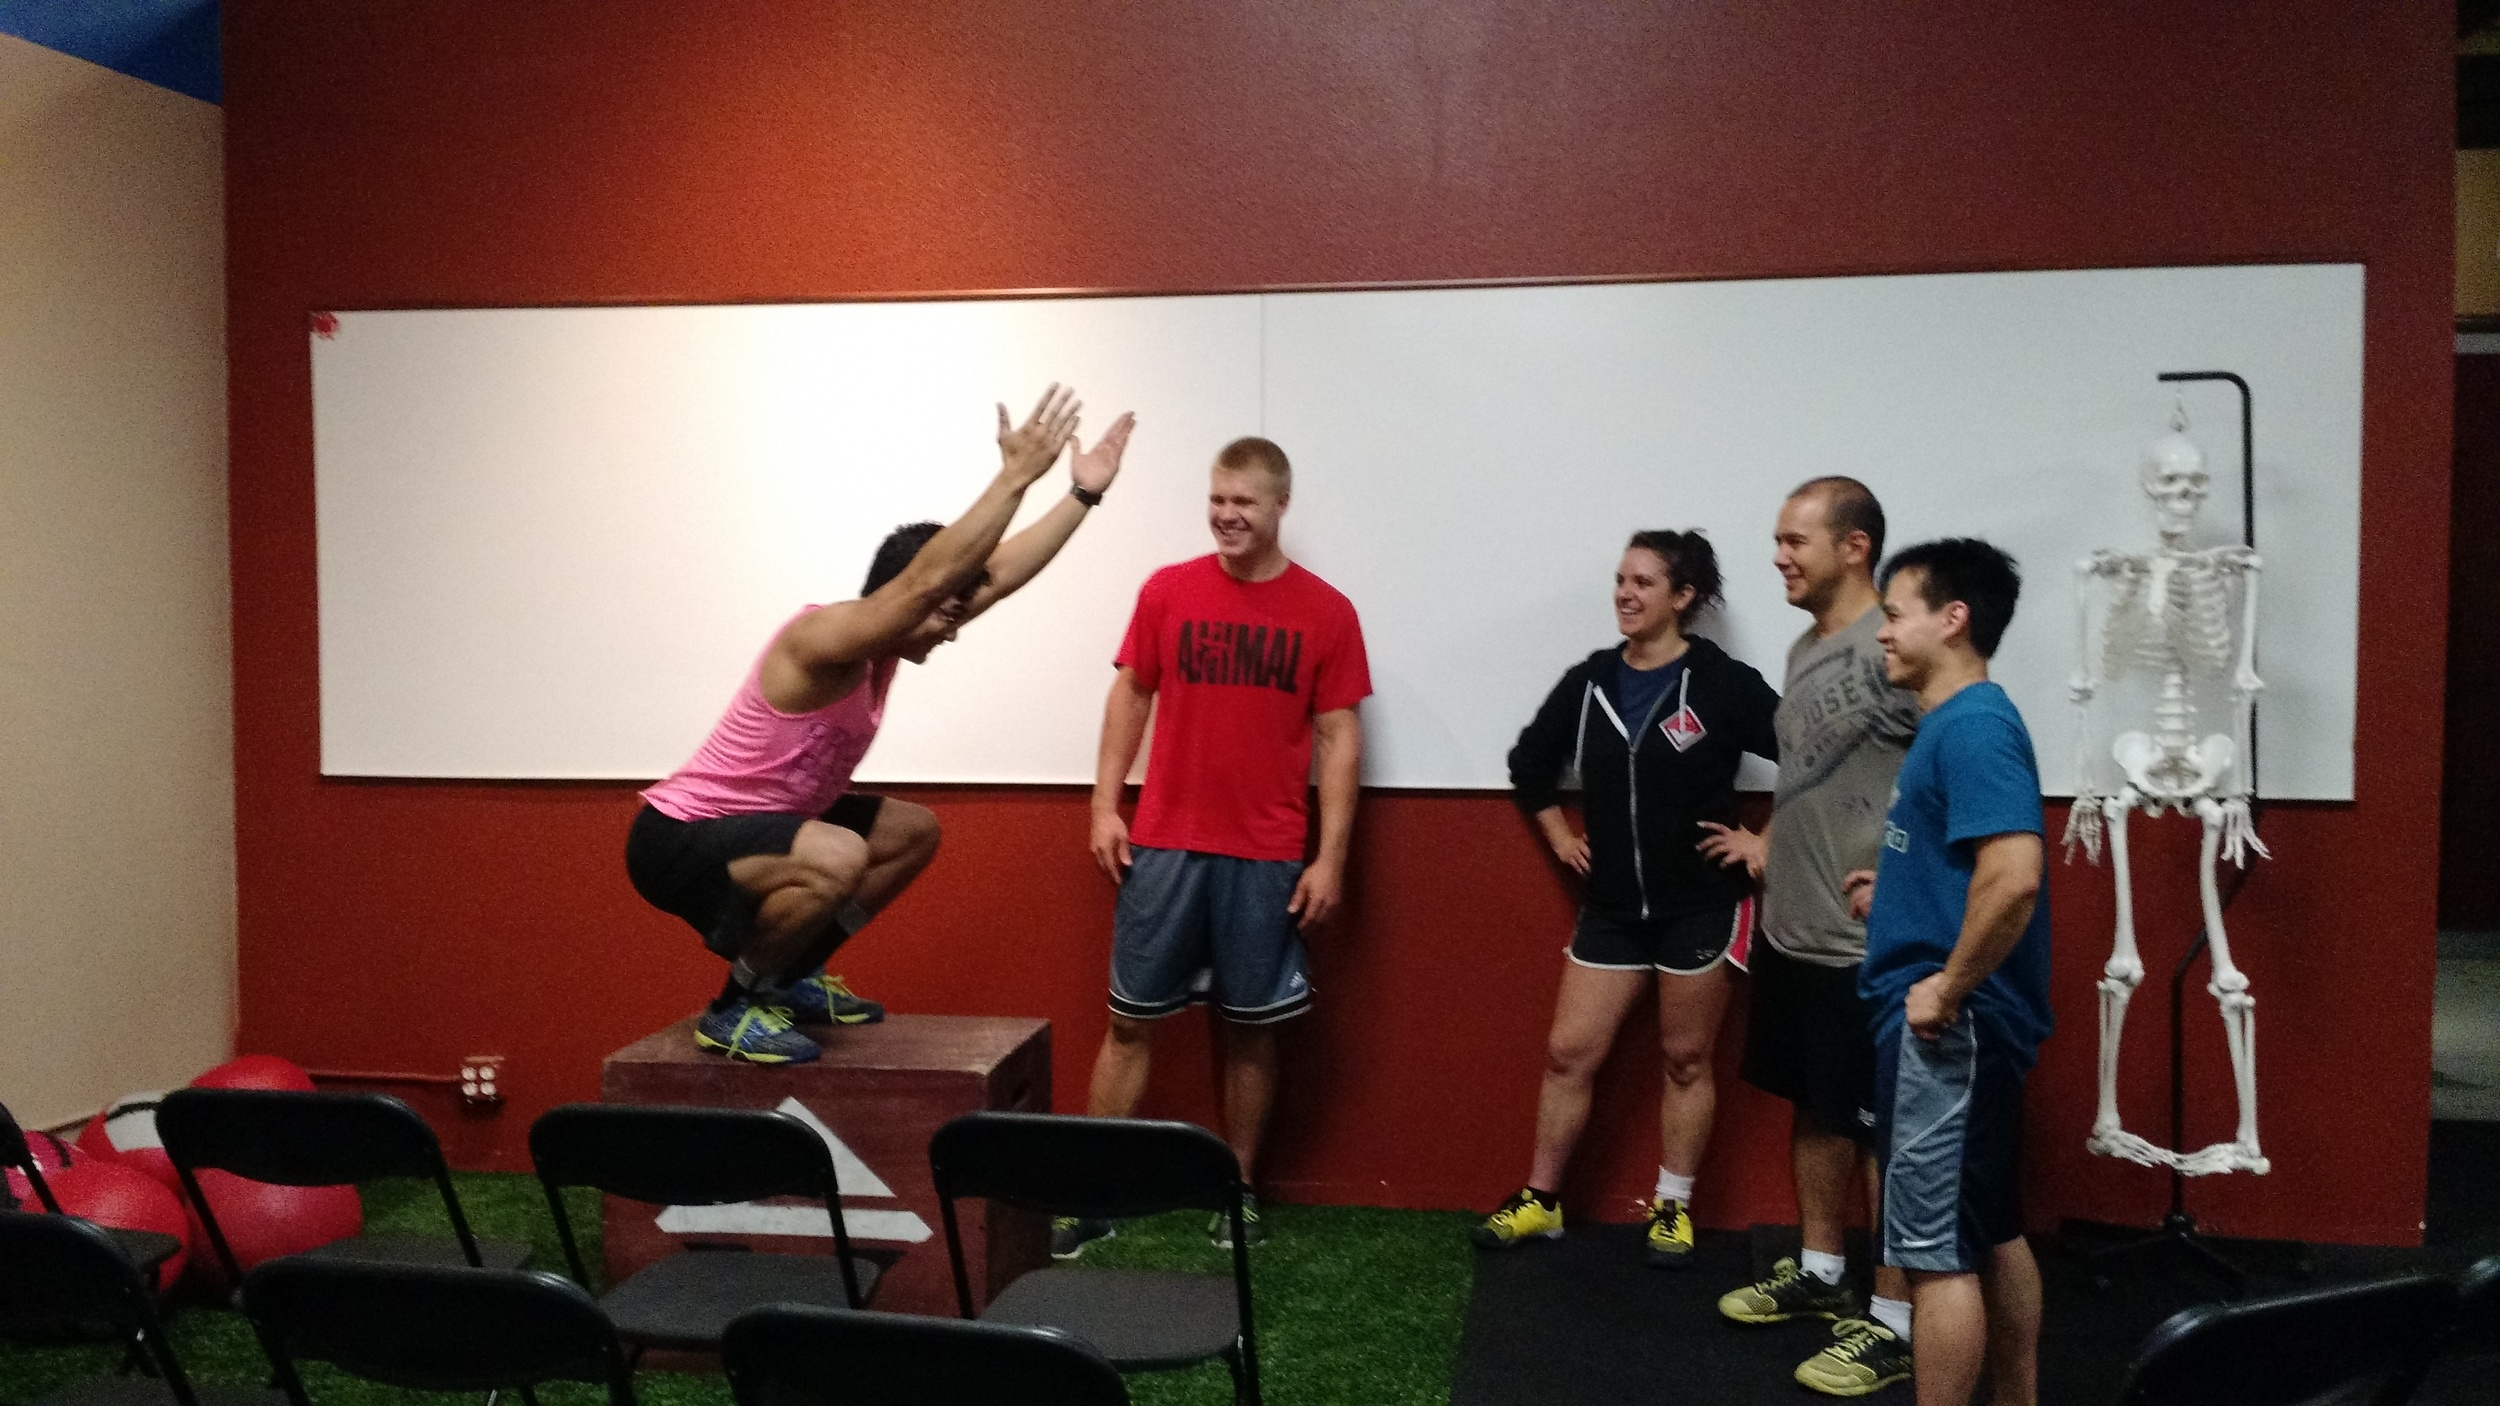 CJ, Vanessa, Dan, Yman and Craig assess Raymond's squat mechanics. (Craig lost some weight)